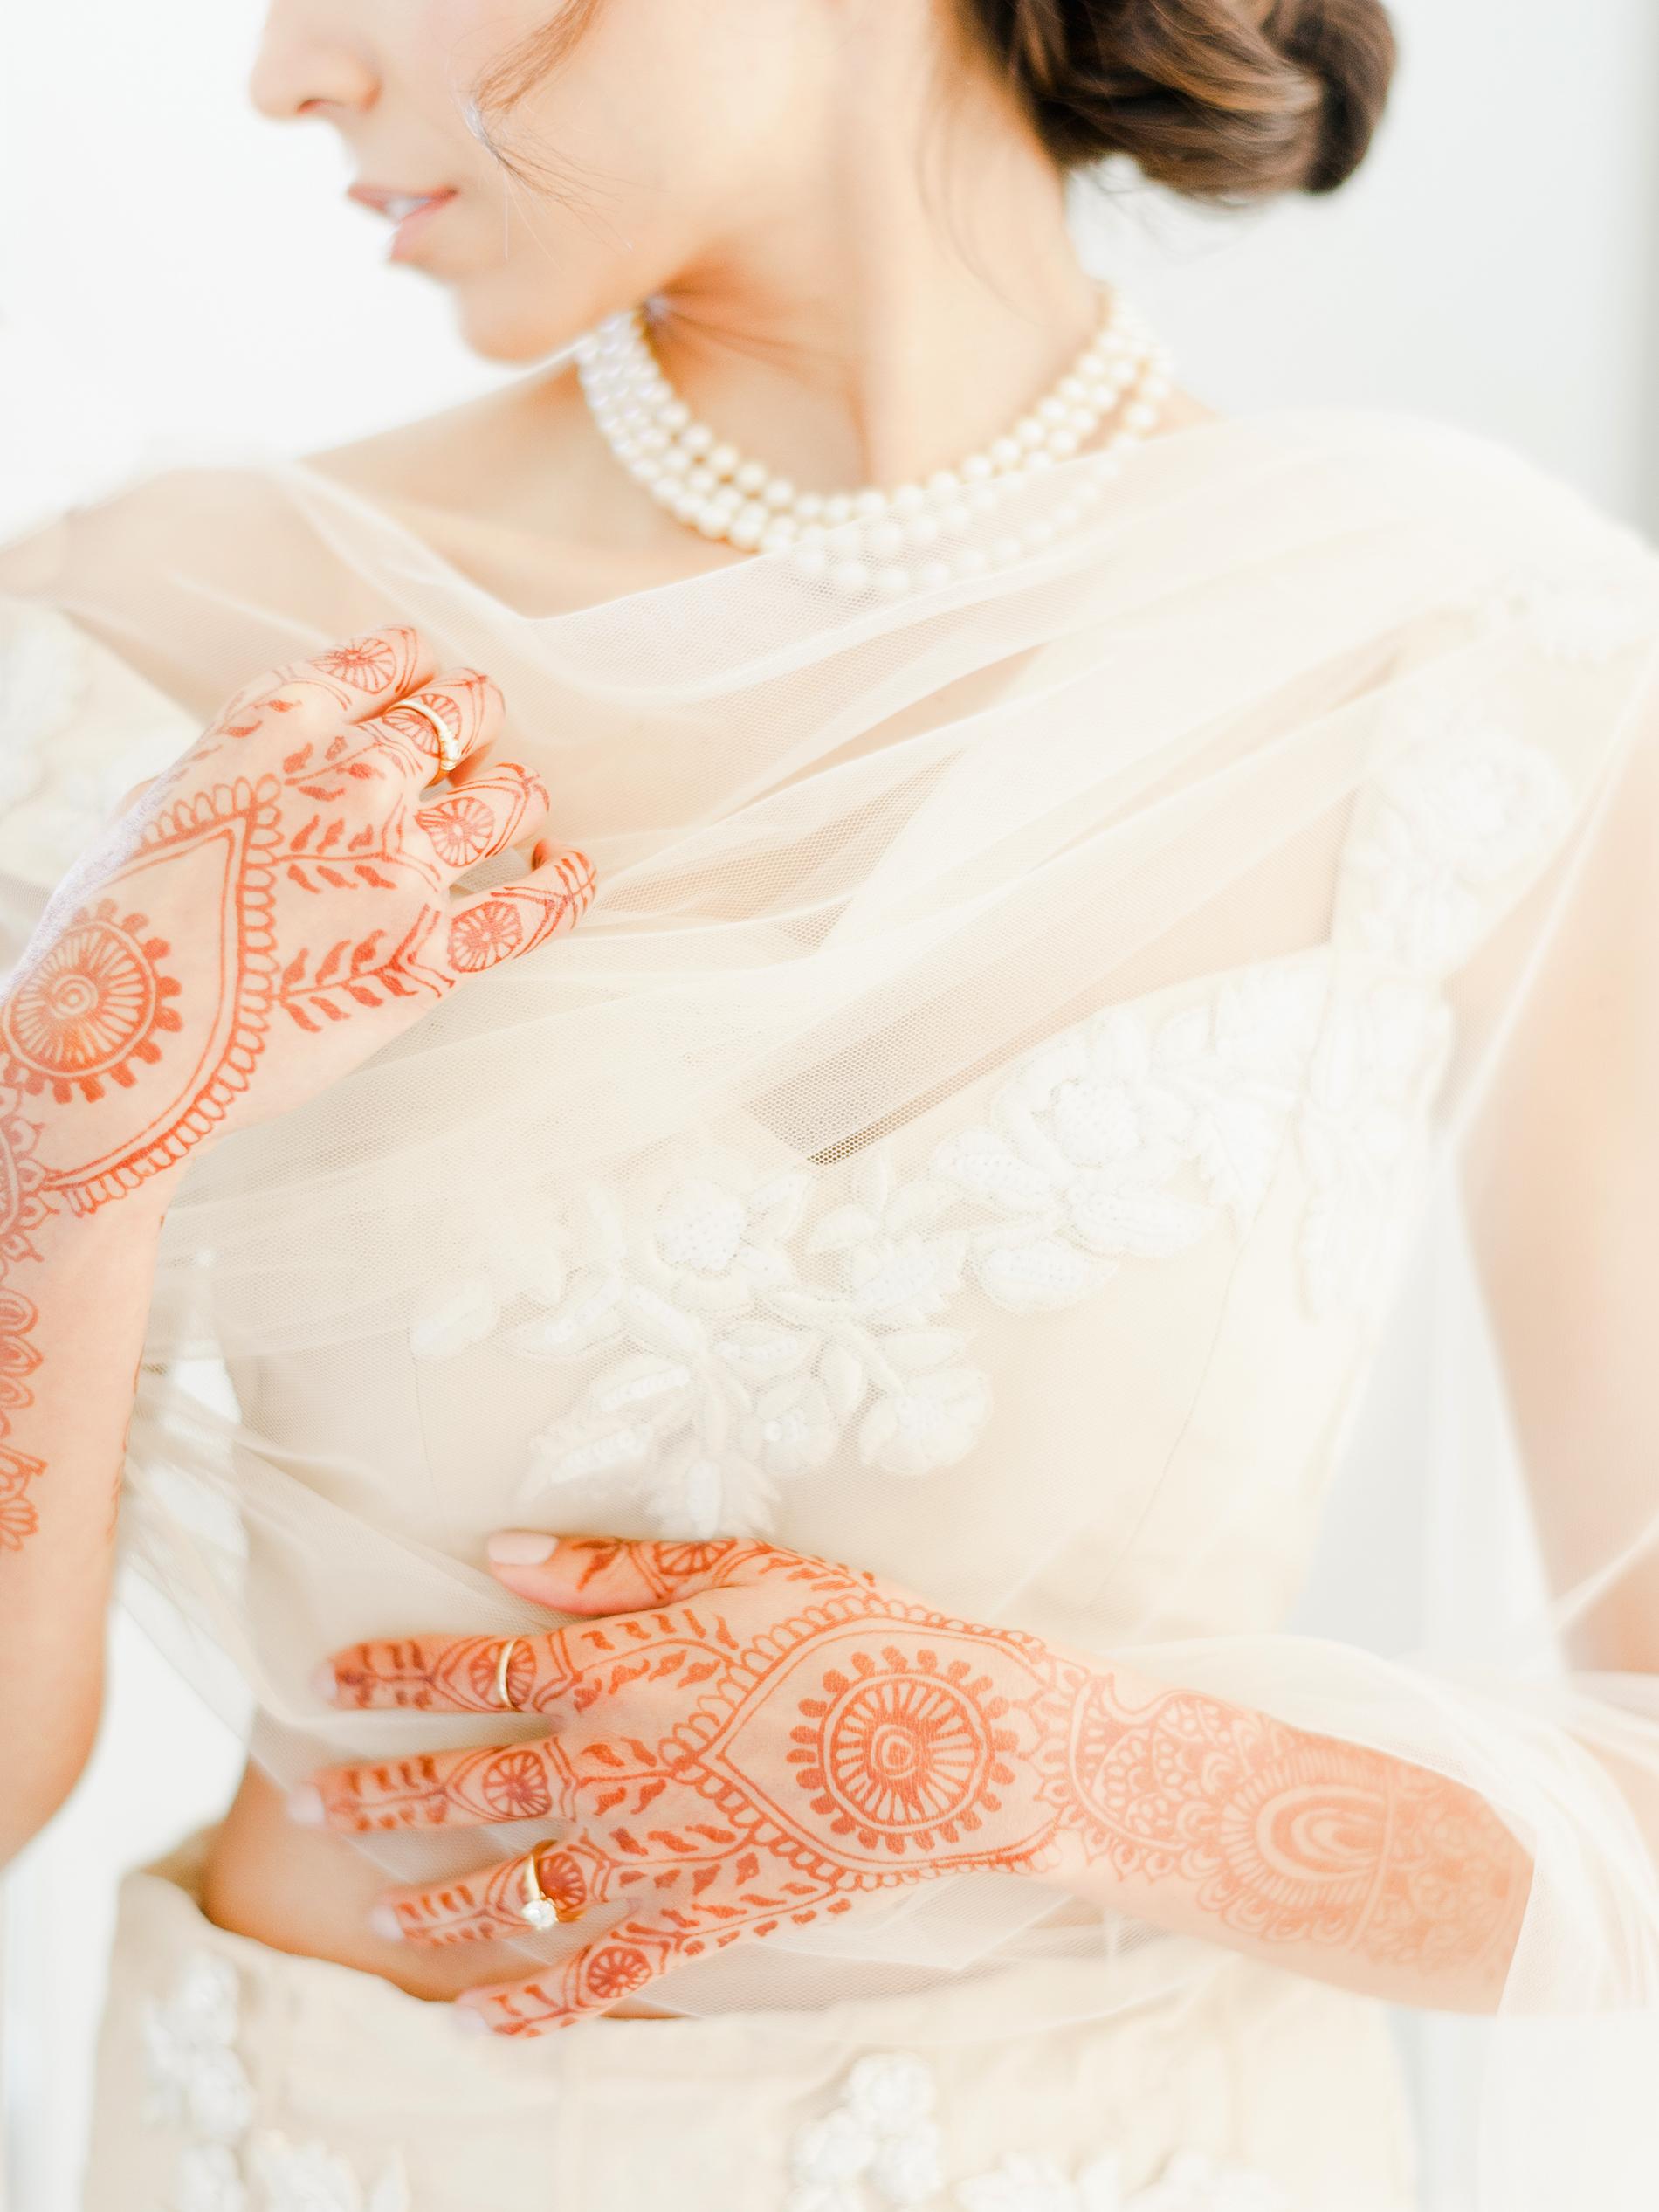 anuja nikhil wedding bride henna